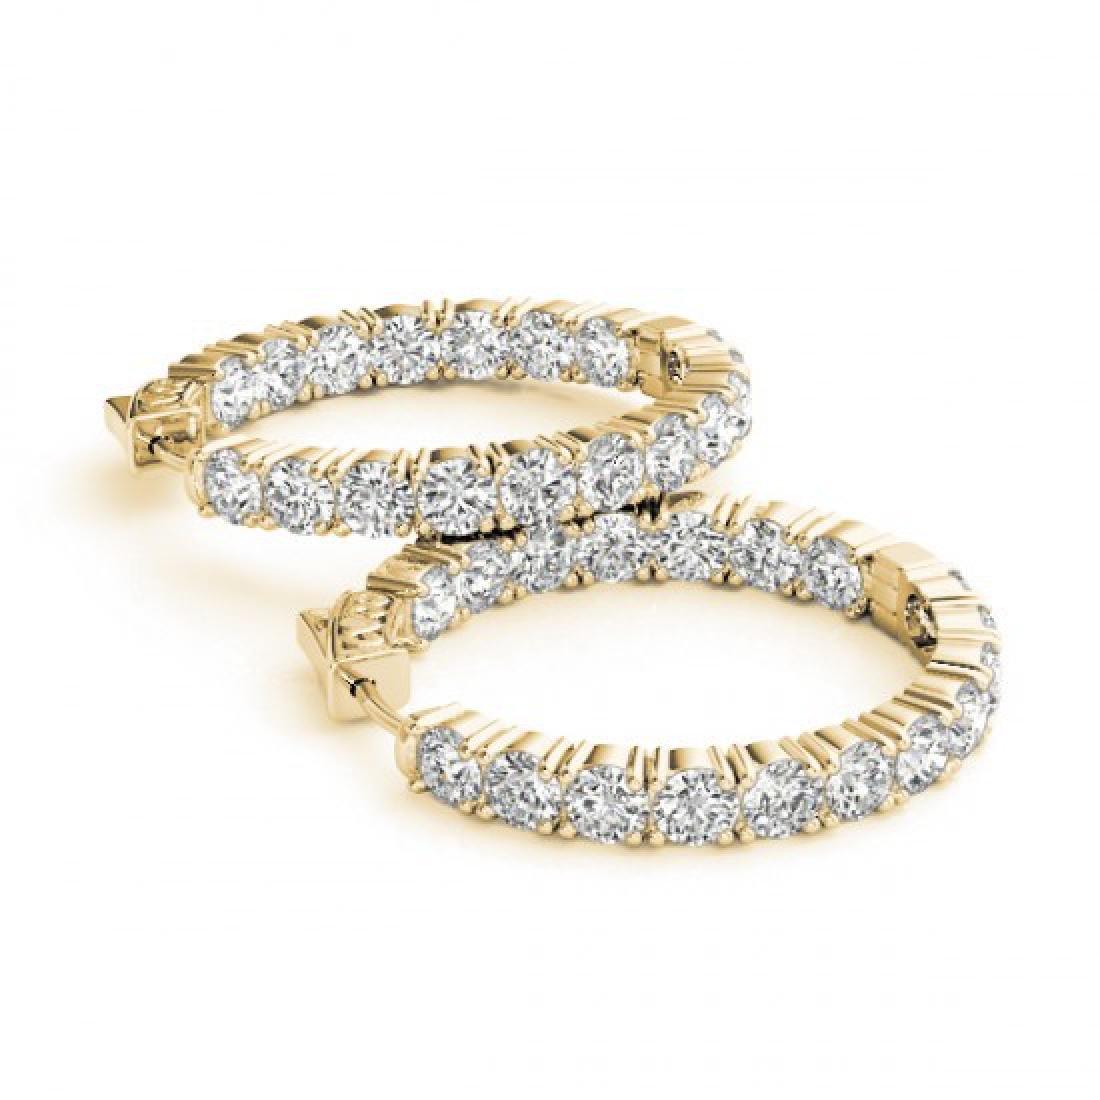 7.5 CTW Diamond VS/SI Certified 37 Mm Hoop Earrings 14K